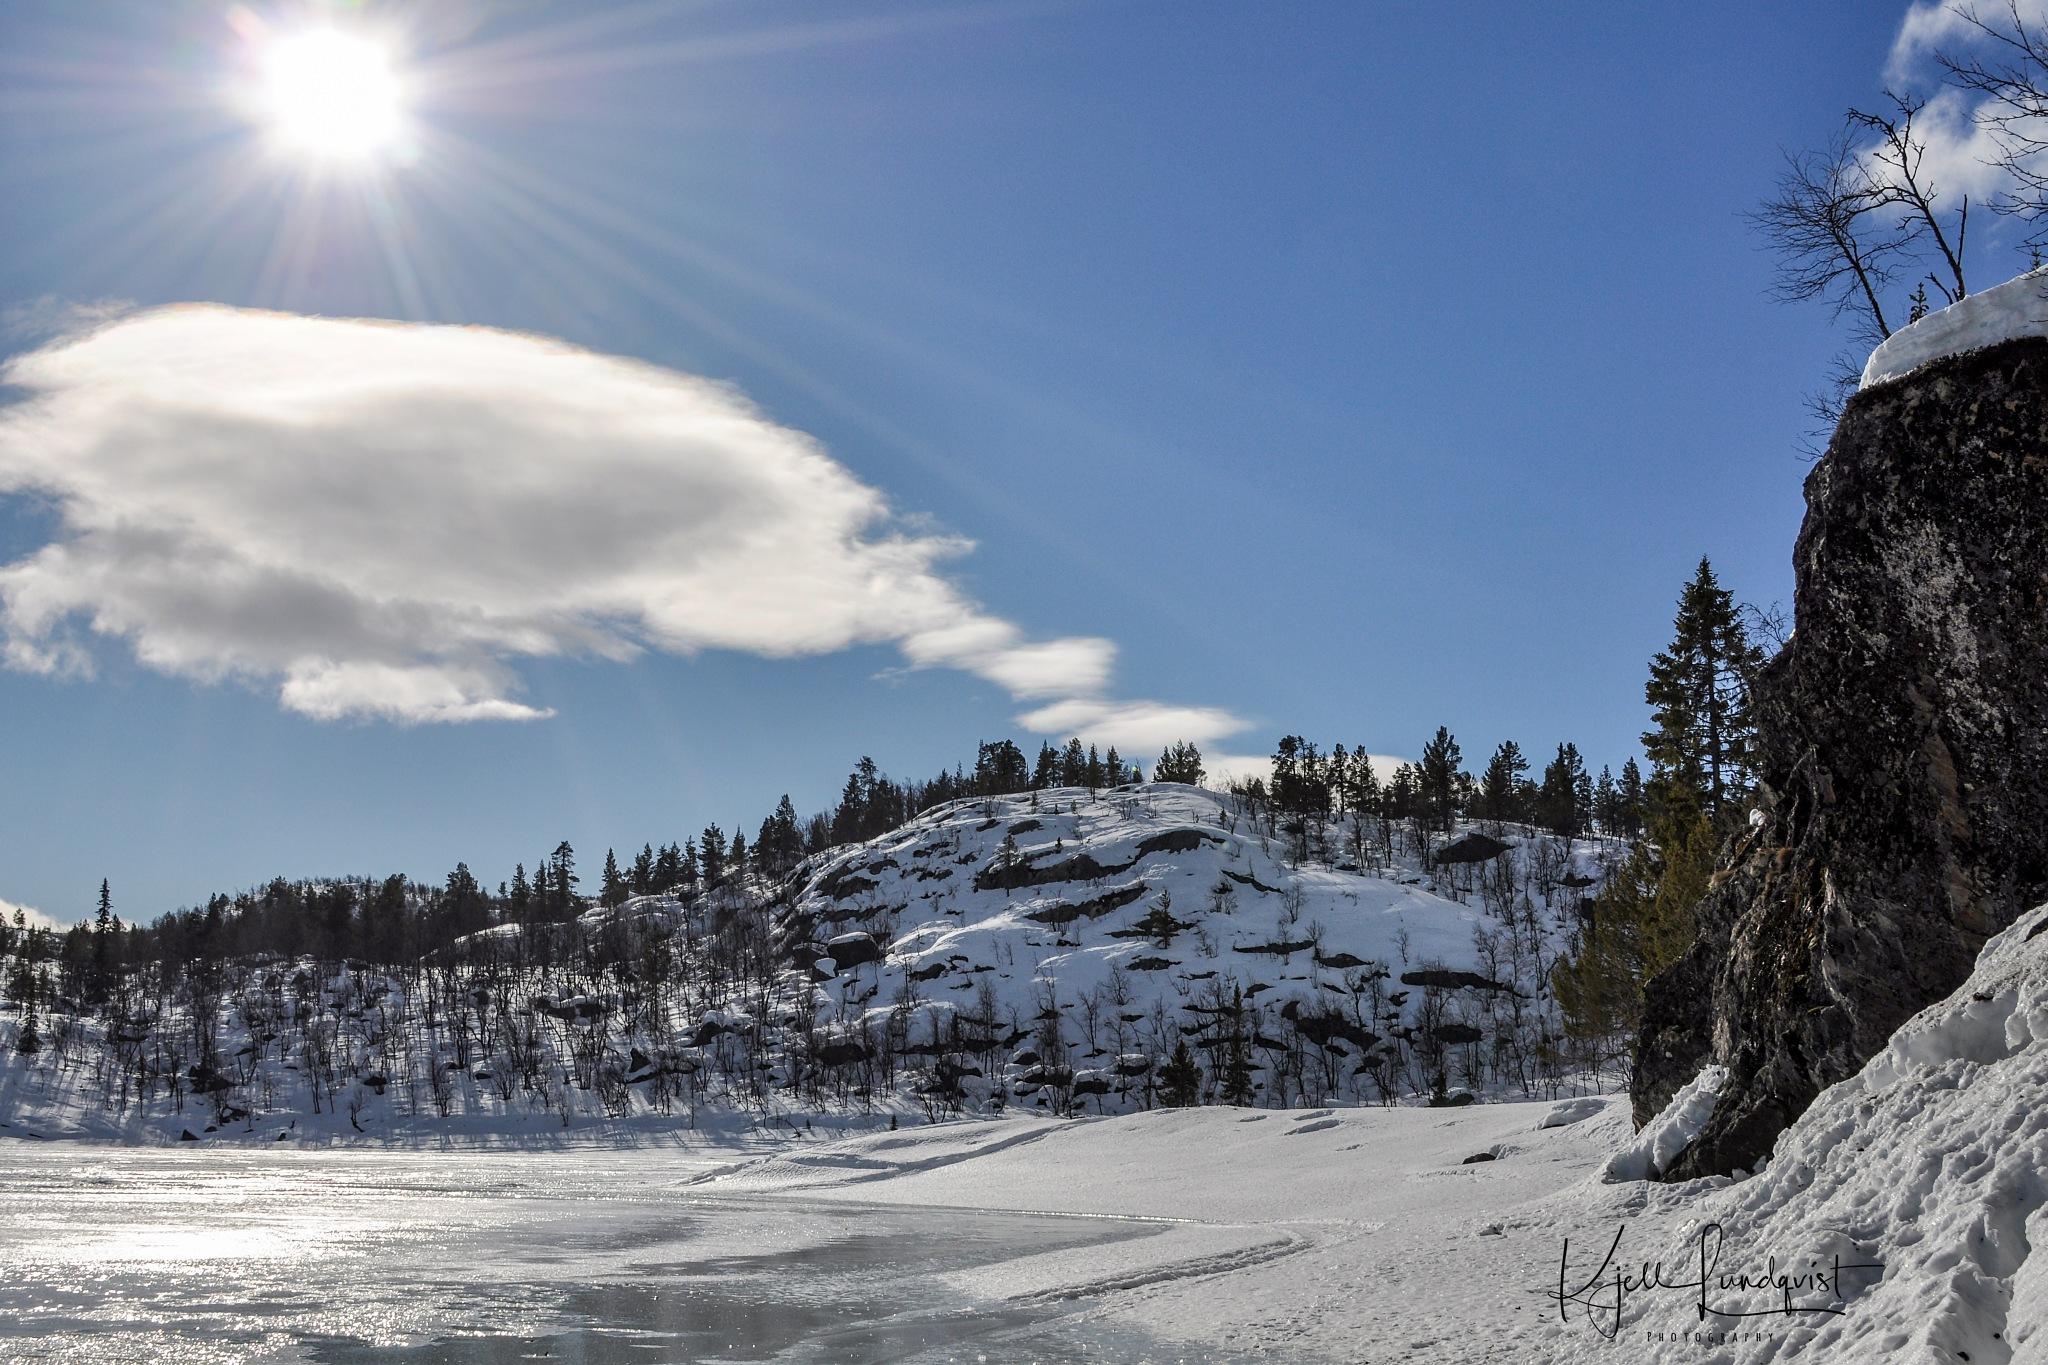 Sun, cloud, ice and snow by Kjell Lundqvist